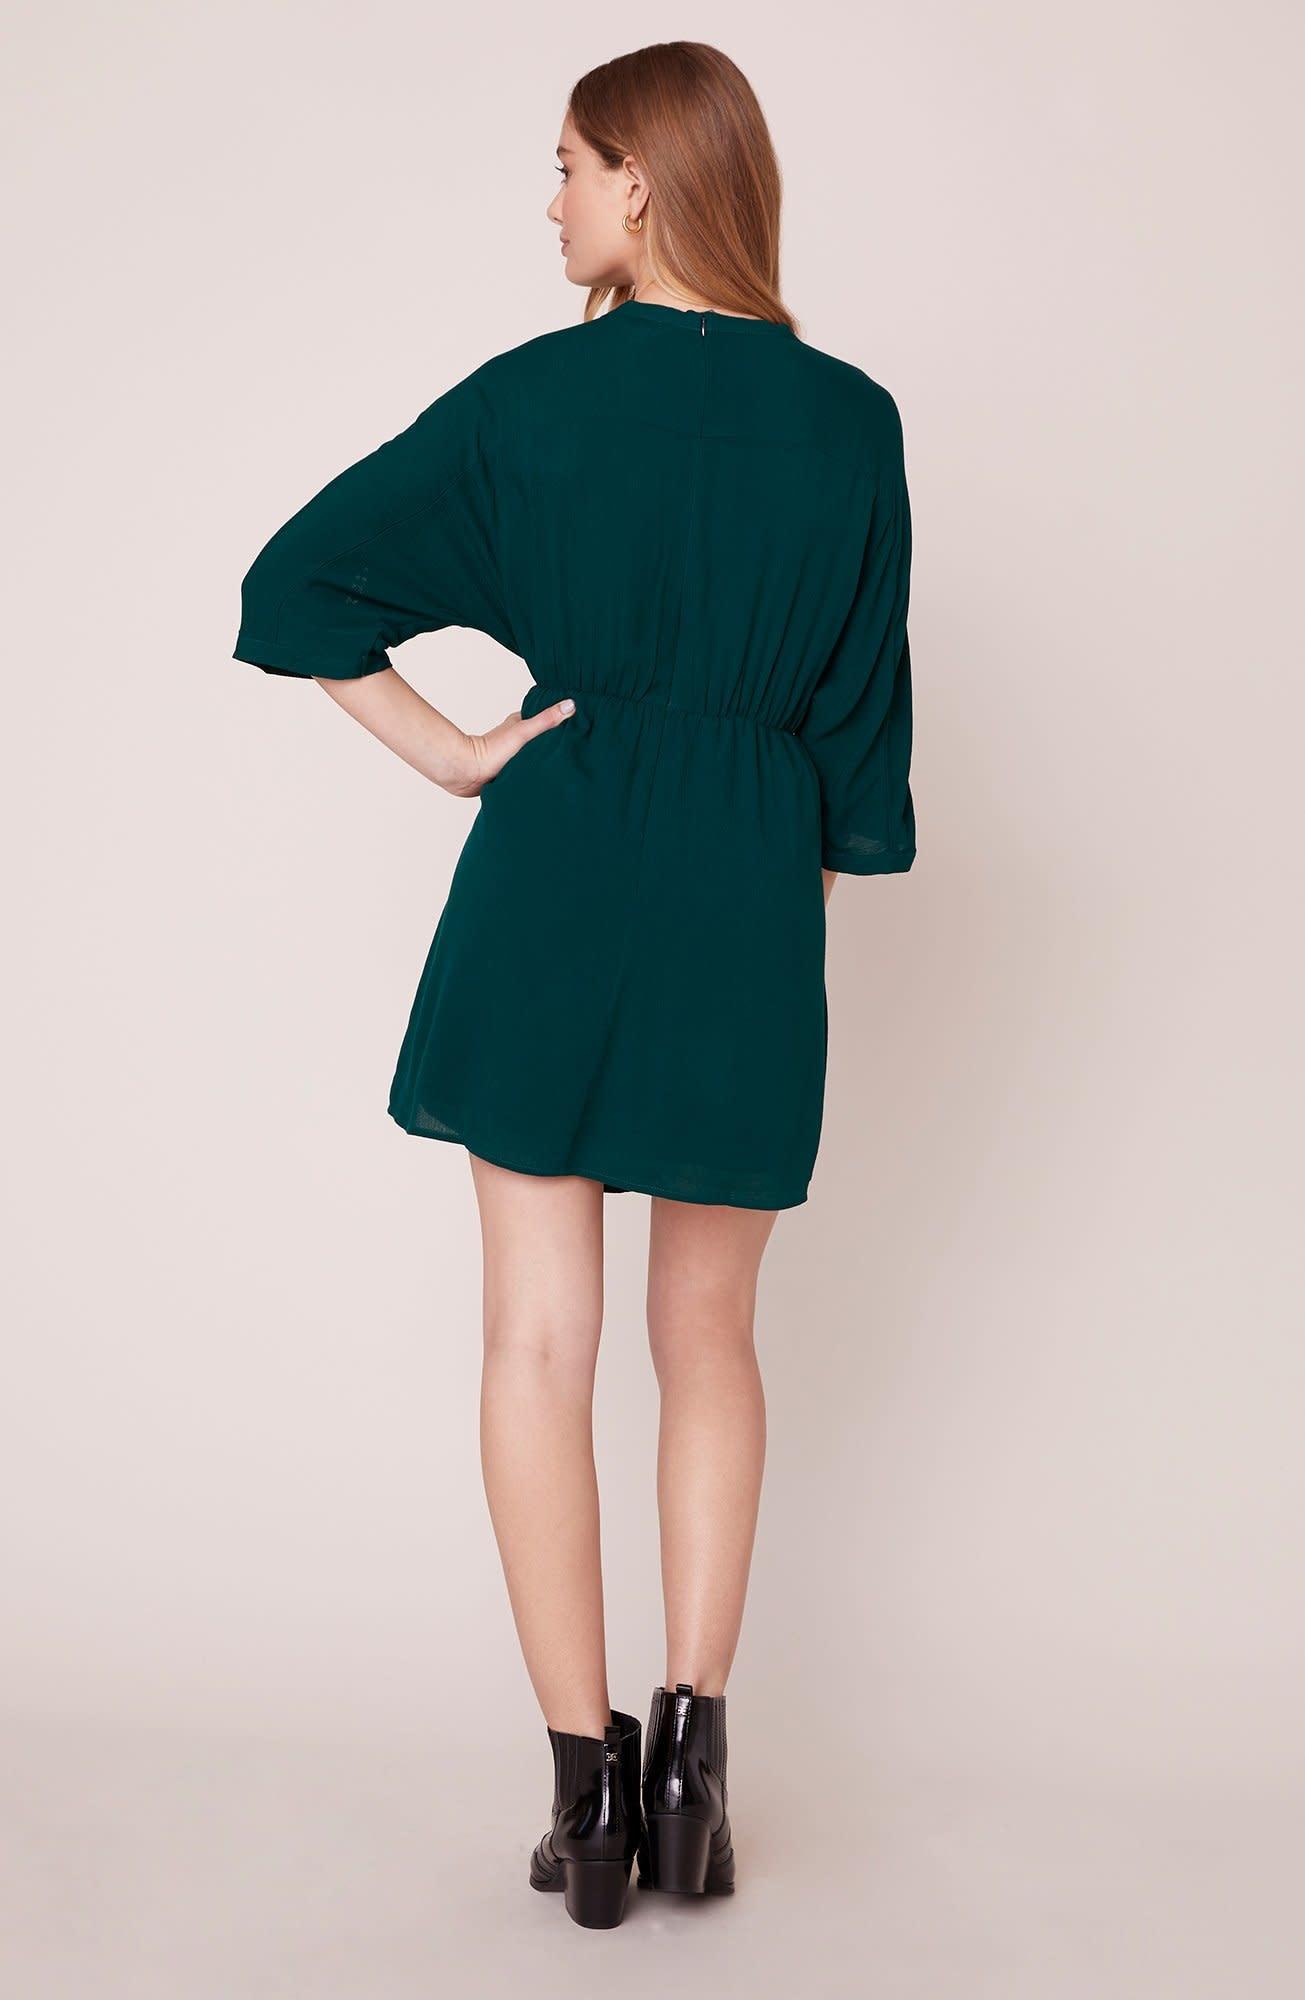 Jack by BB Dakota Wishful Thinking Dolman Sleeve Dress